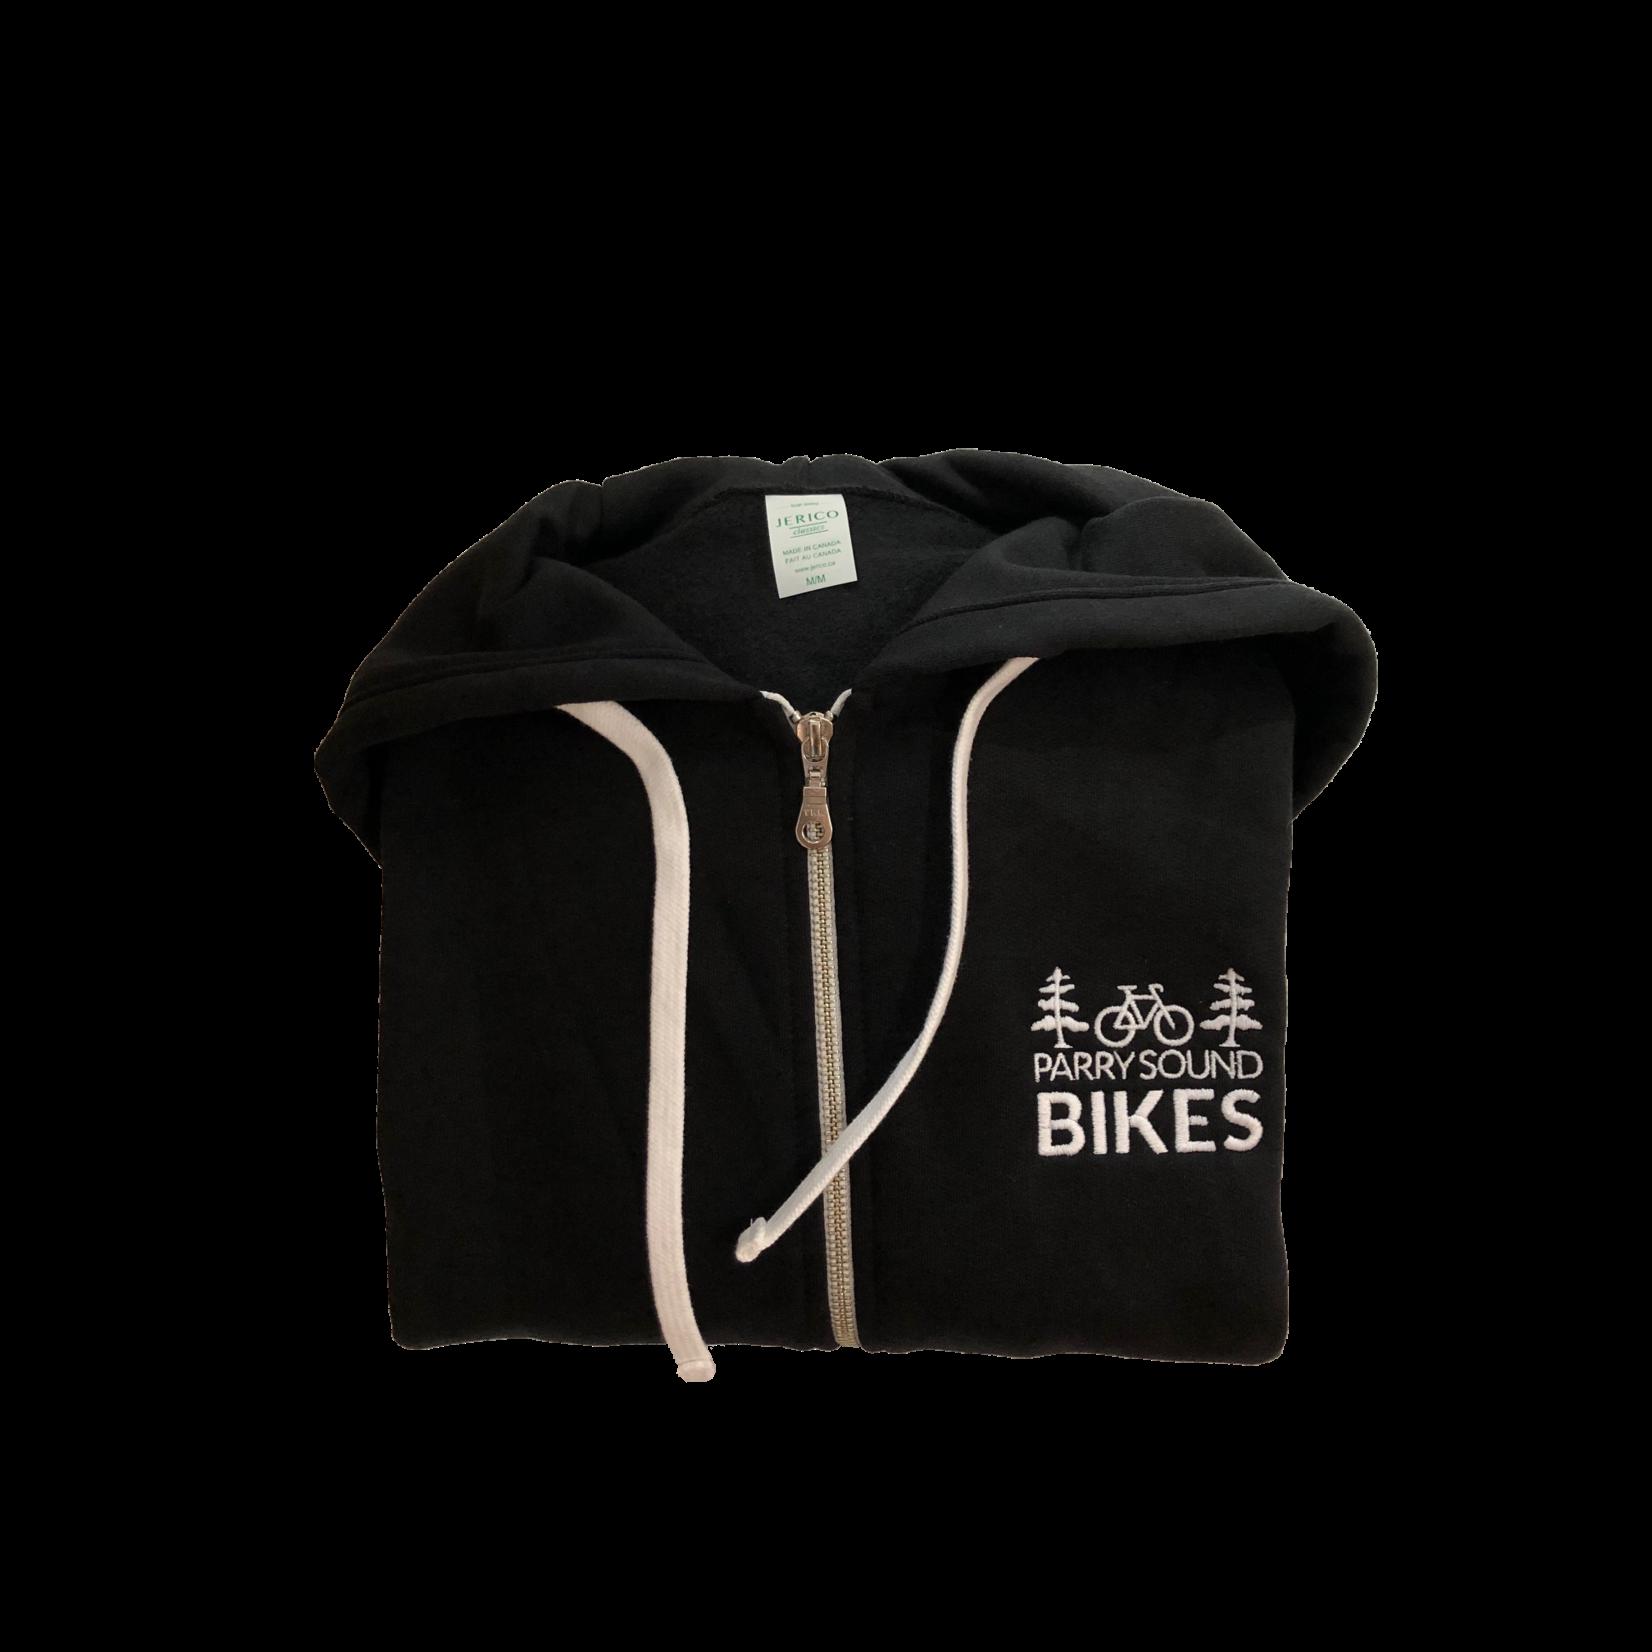 Parry Sound Bikes Parry Sound Bikes Zip Up Hoodie